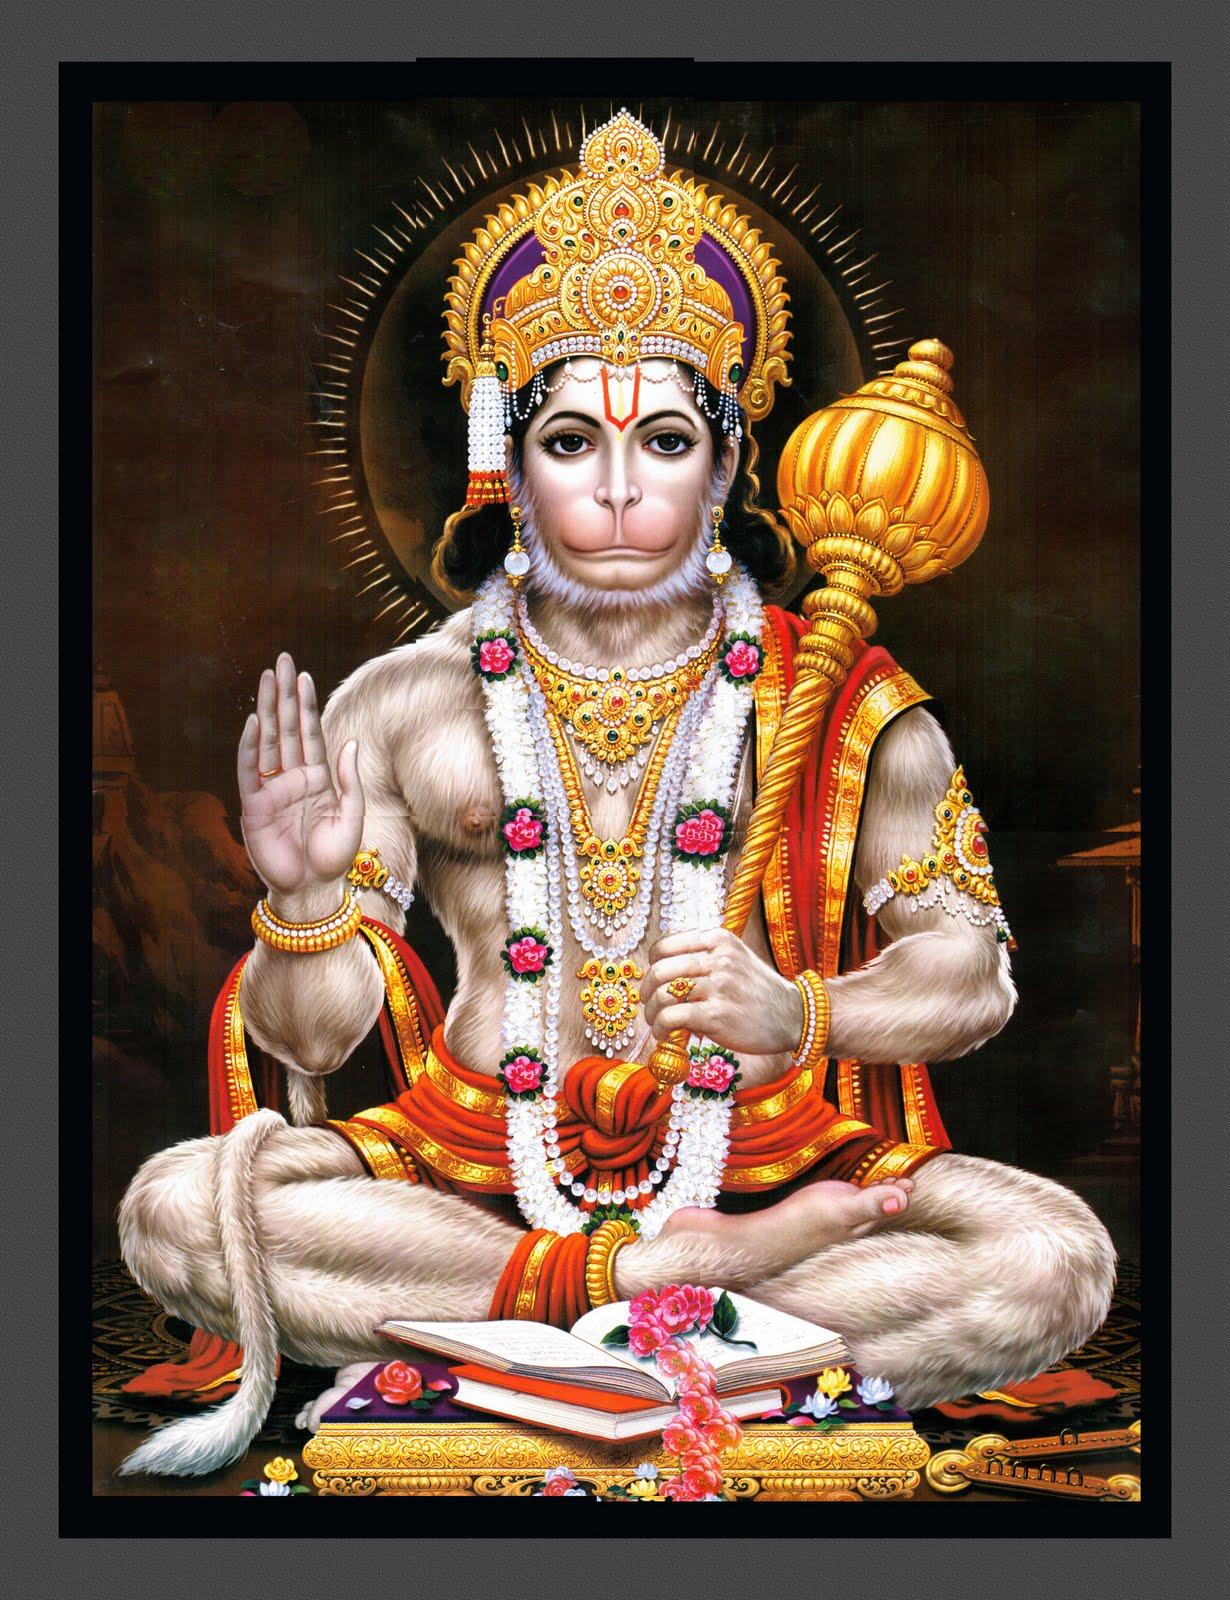 Hd wallpaper hanuman - Lord Hanuman Ji Adbhut Images And Hd Wallpapers Collection